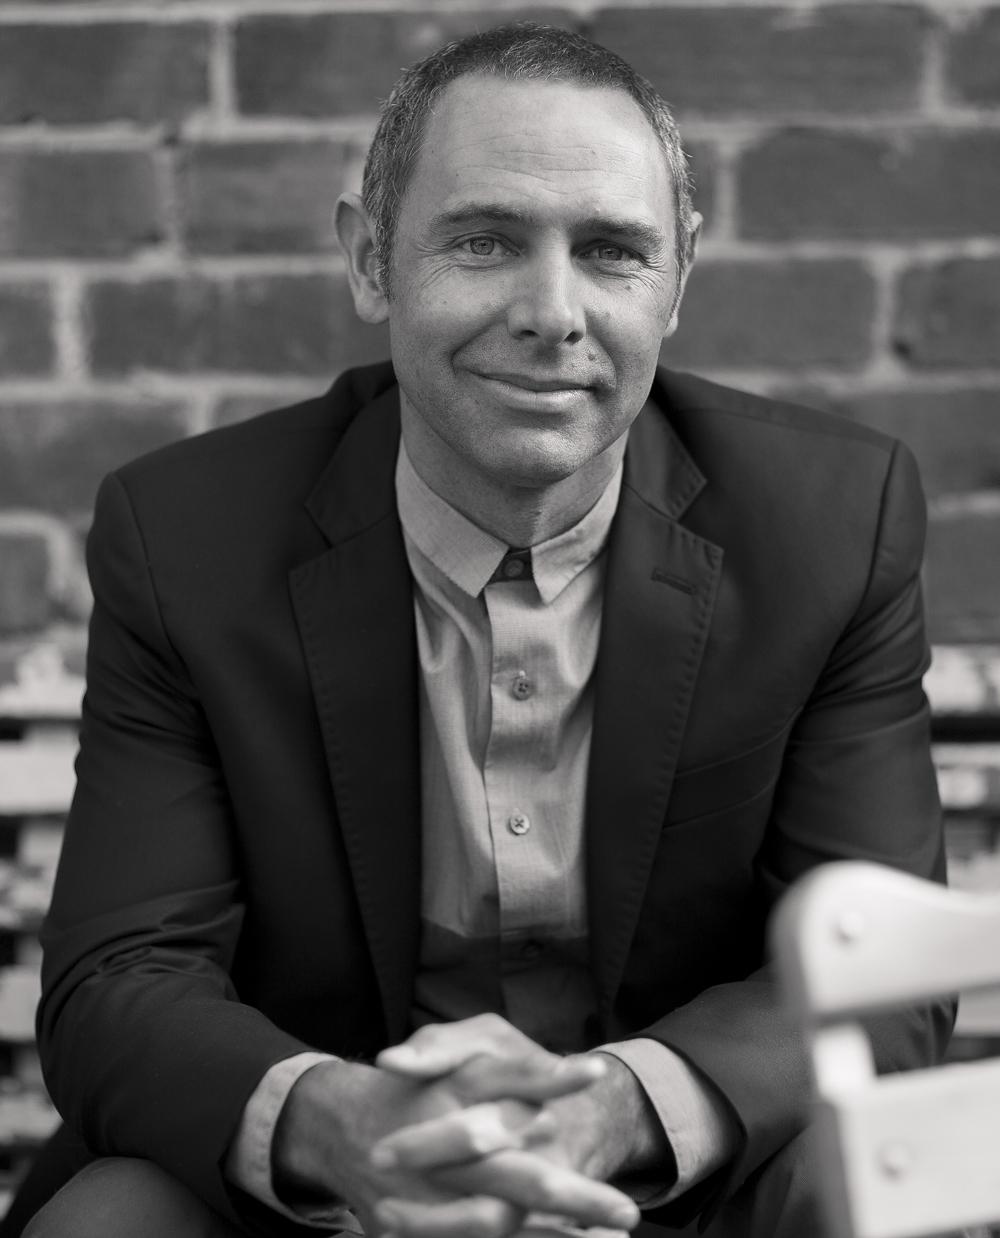 Jeremy McLeod, Founder of Melbourne based company Breathe Architecture